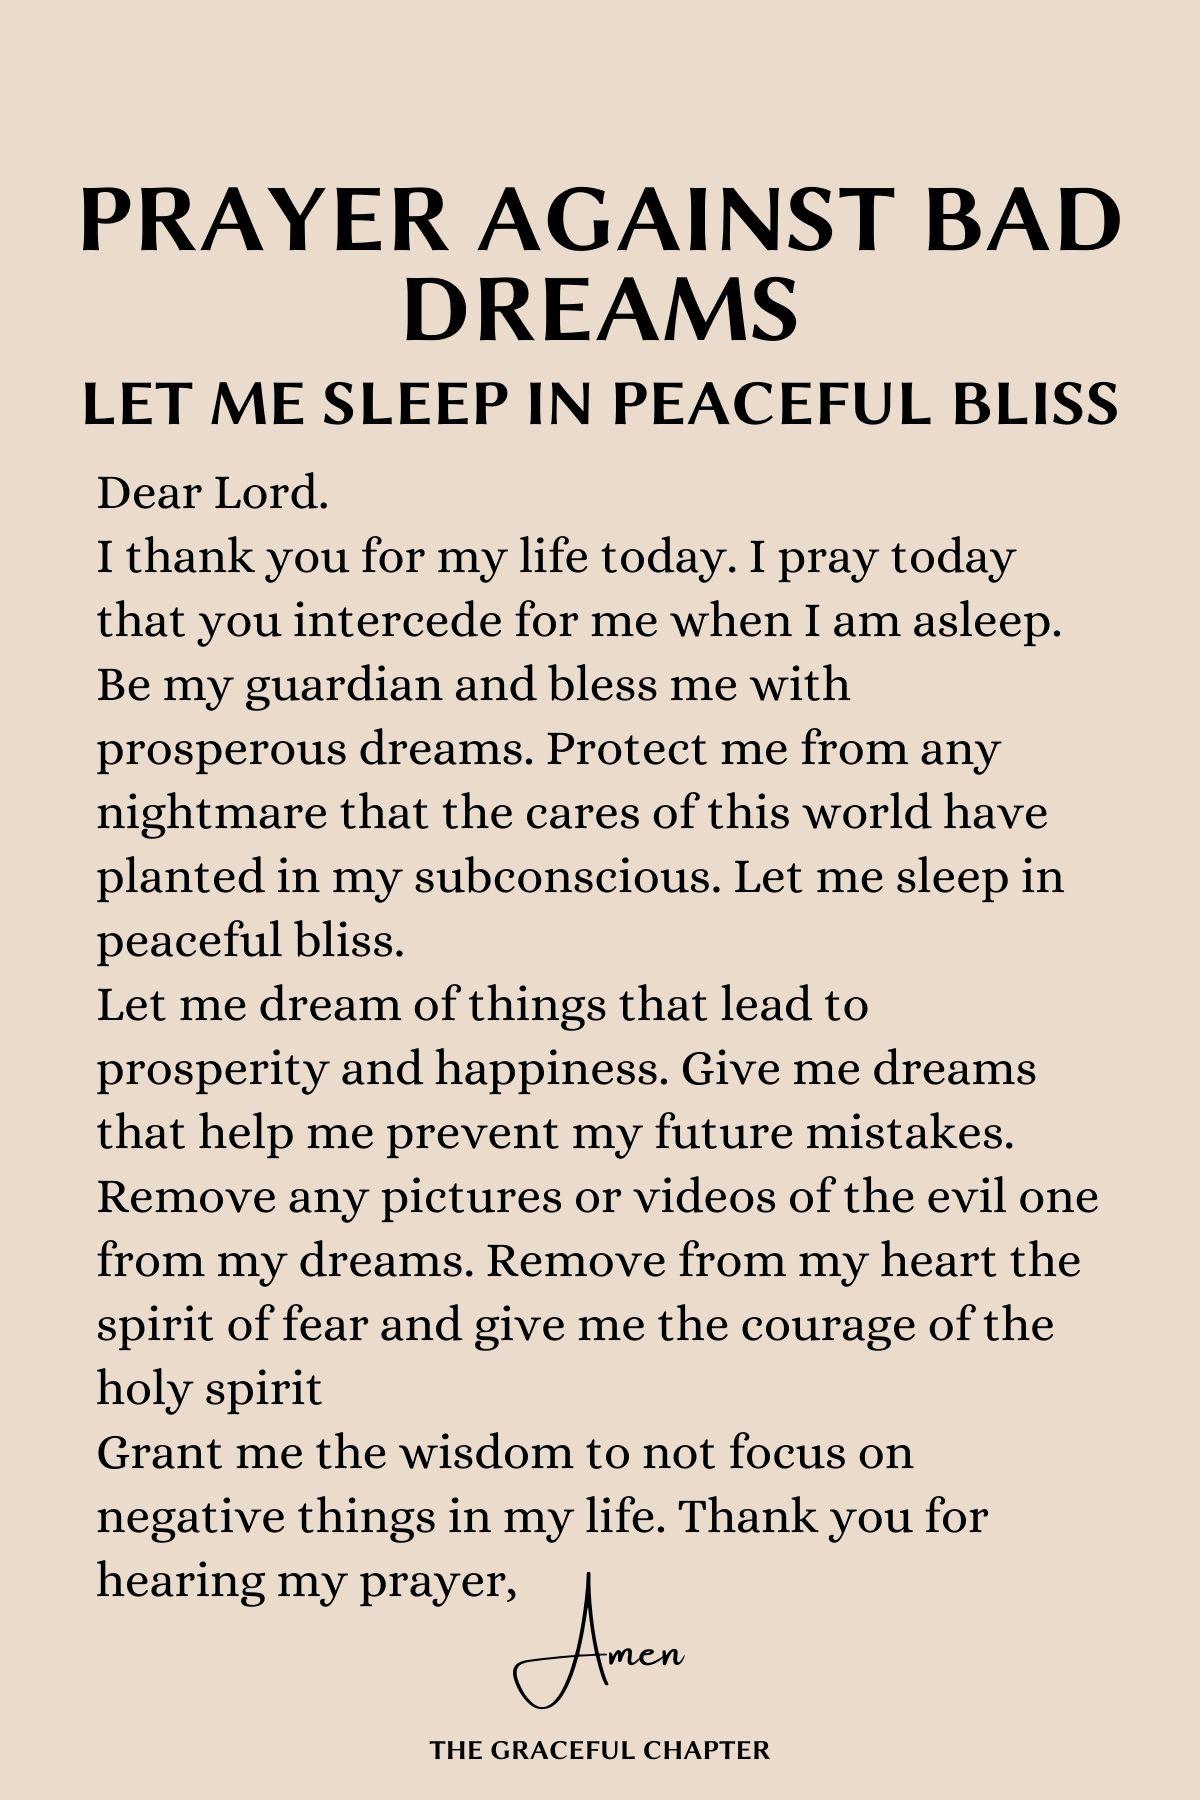 Prayers against bad dreams